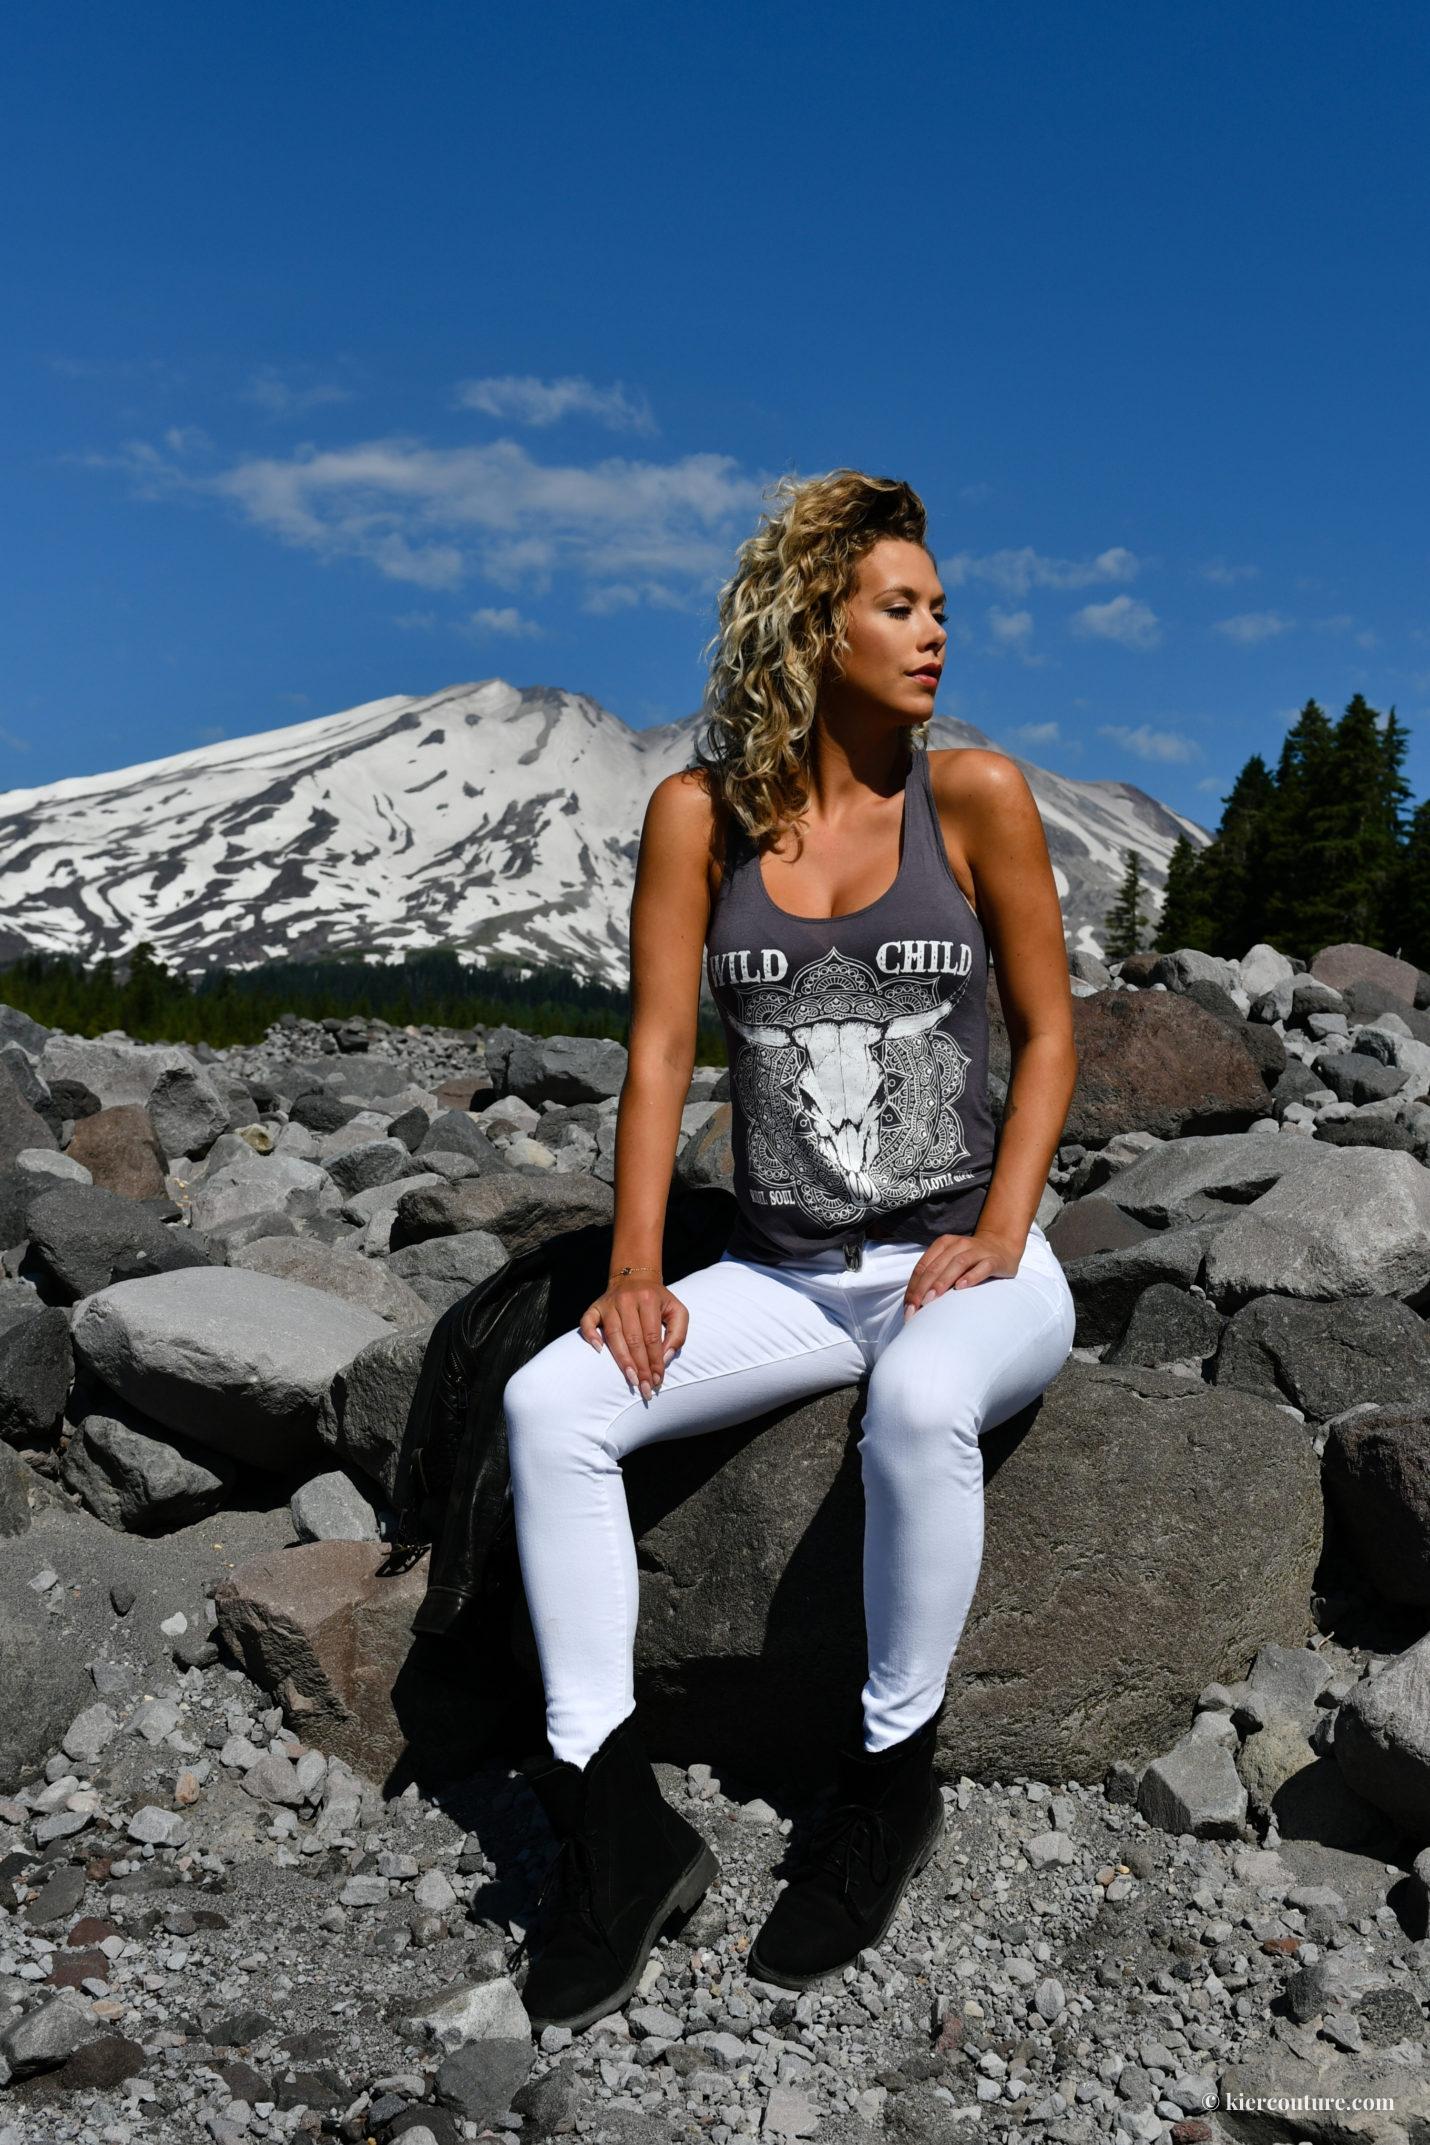 Kier Mellour at Mount St Helens